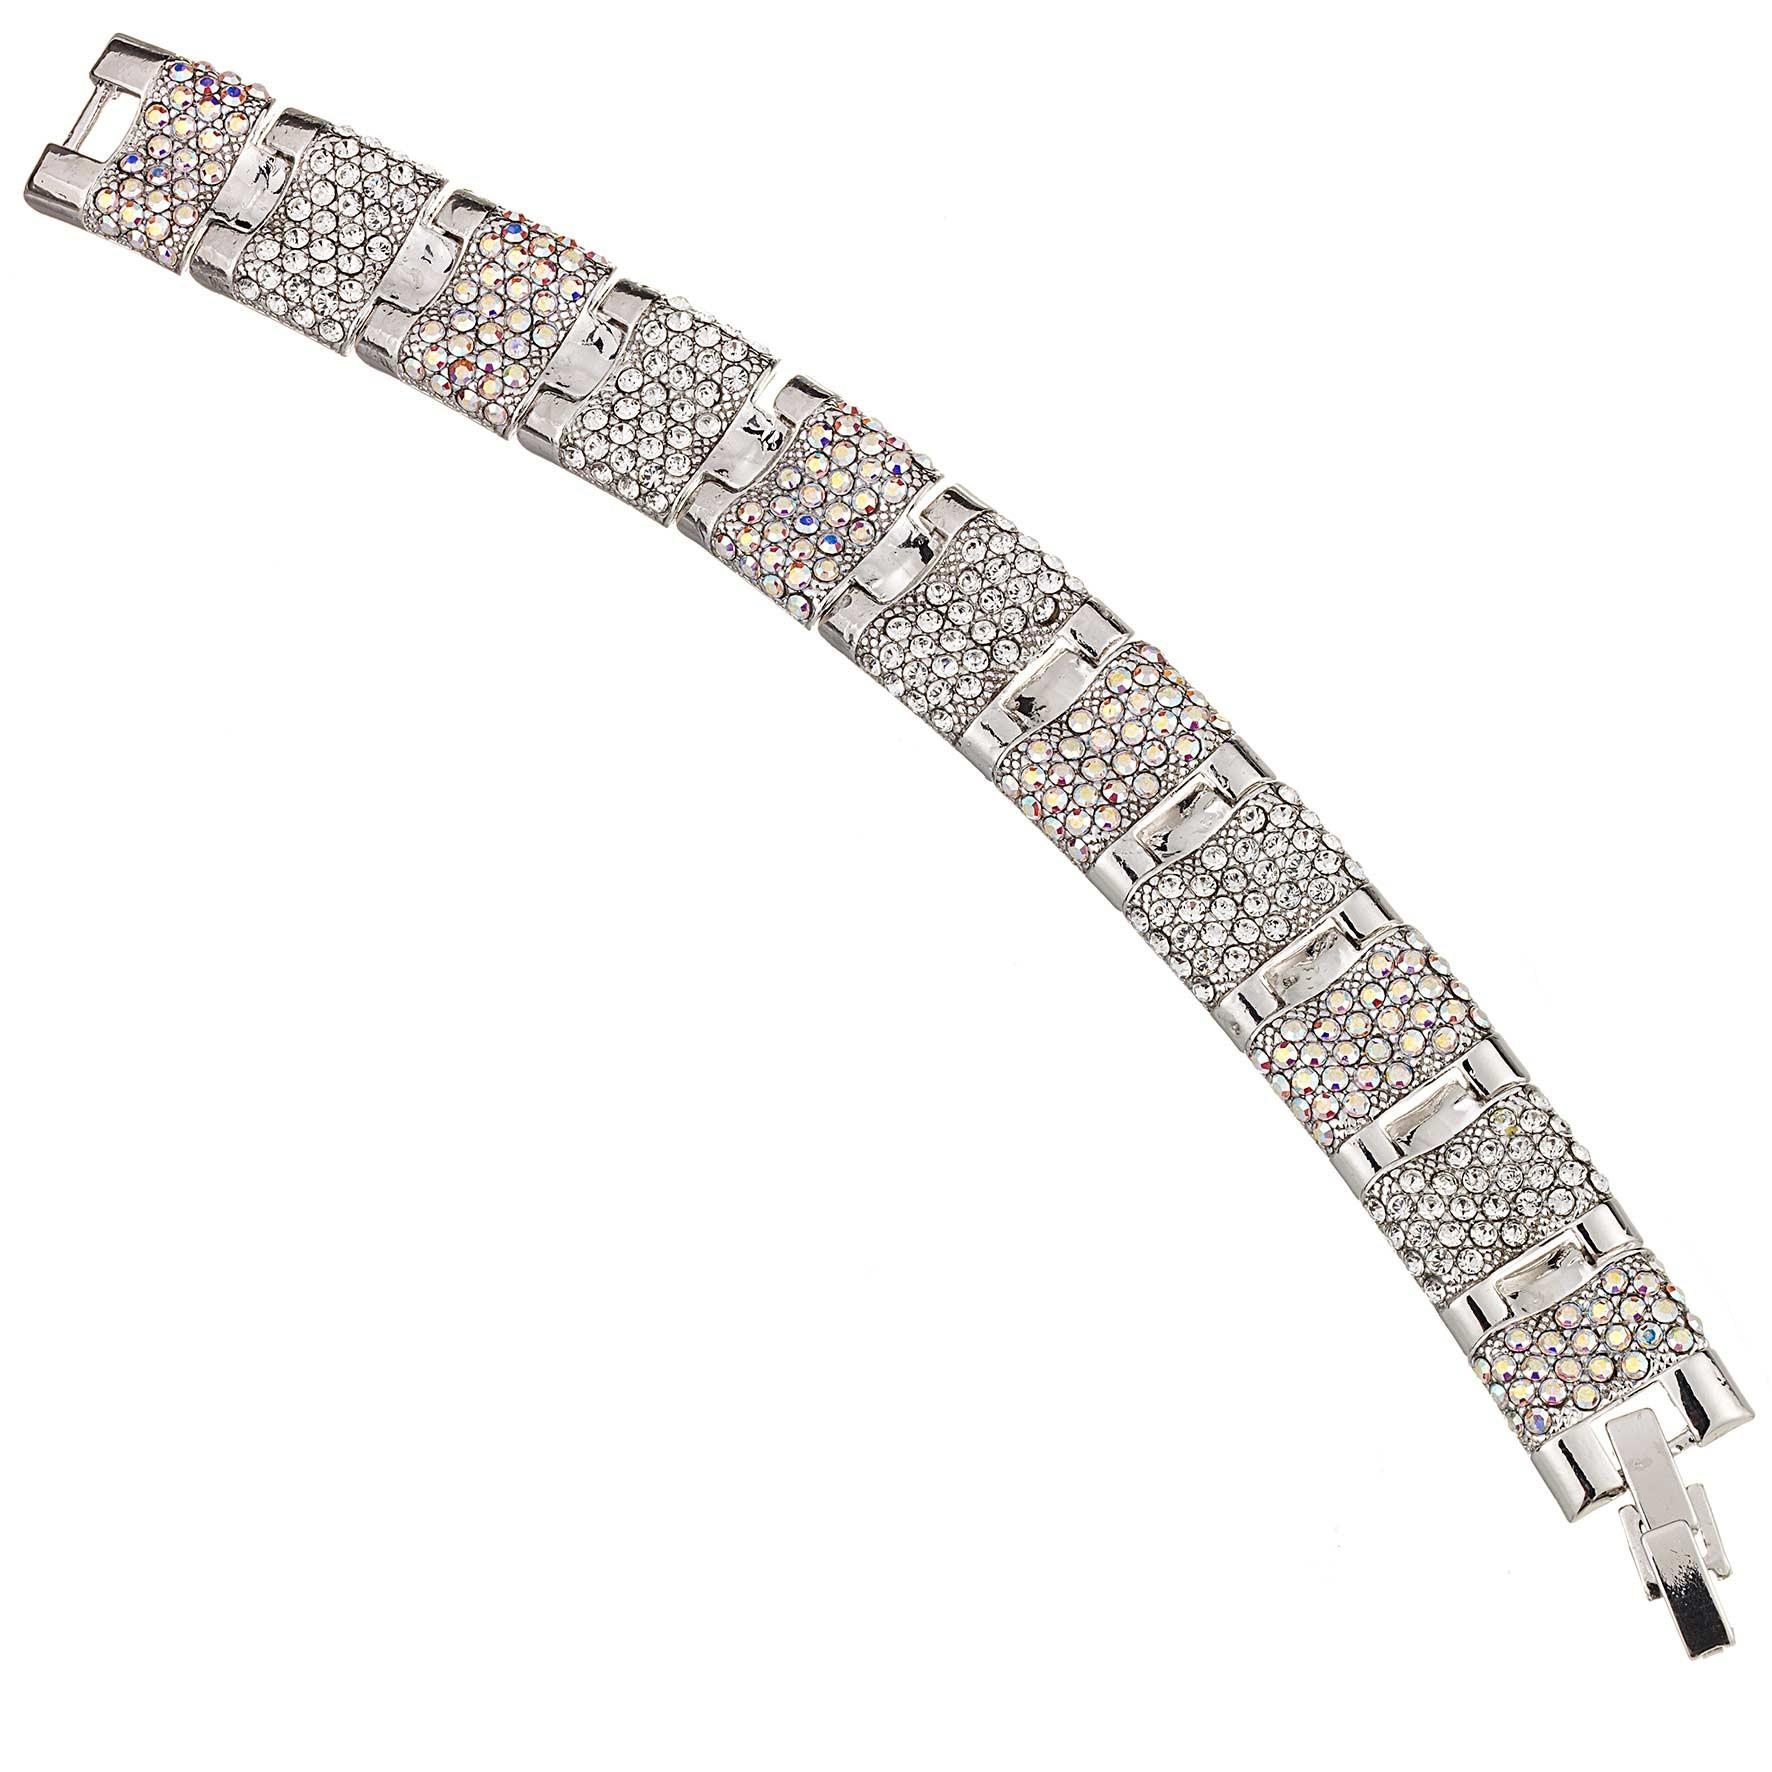 387be4ac4bf8 Swarovski Crystal AB Crystal and Clear Crystal Bracelet Diamond ...